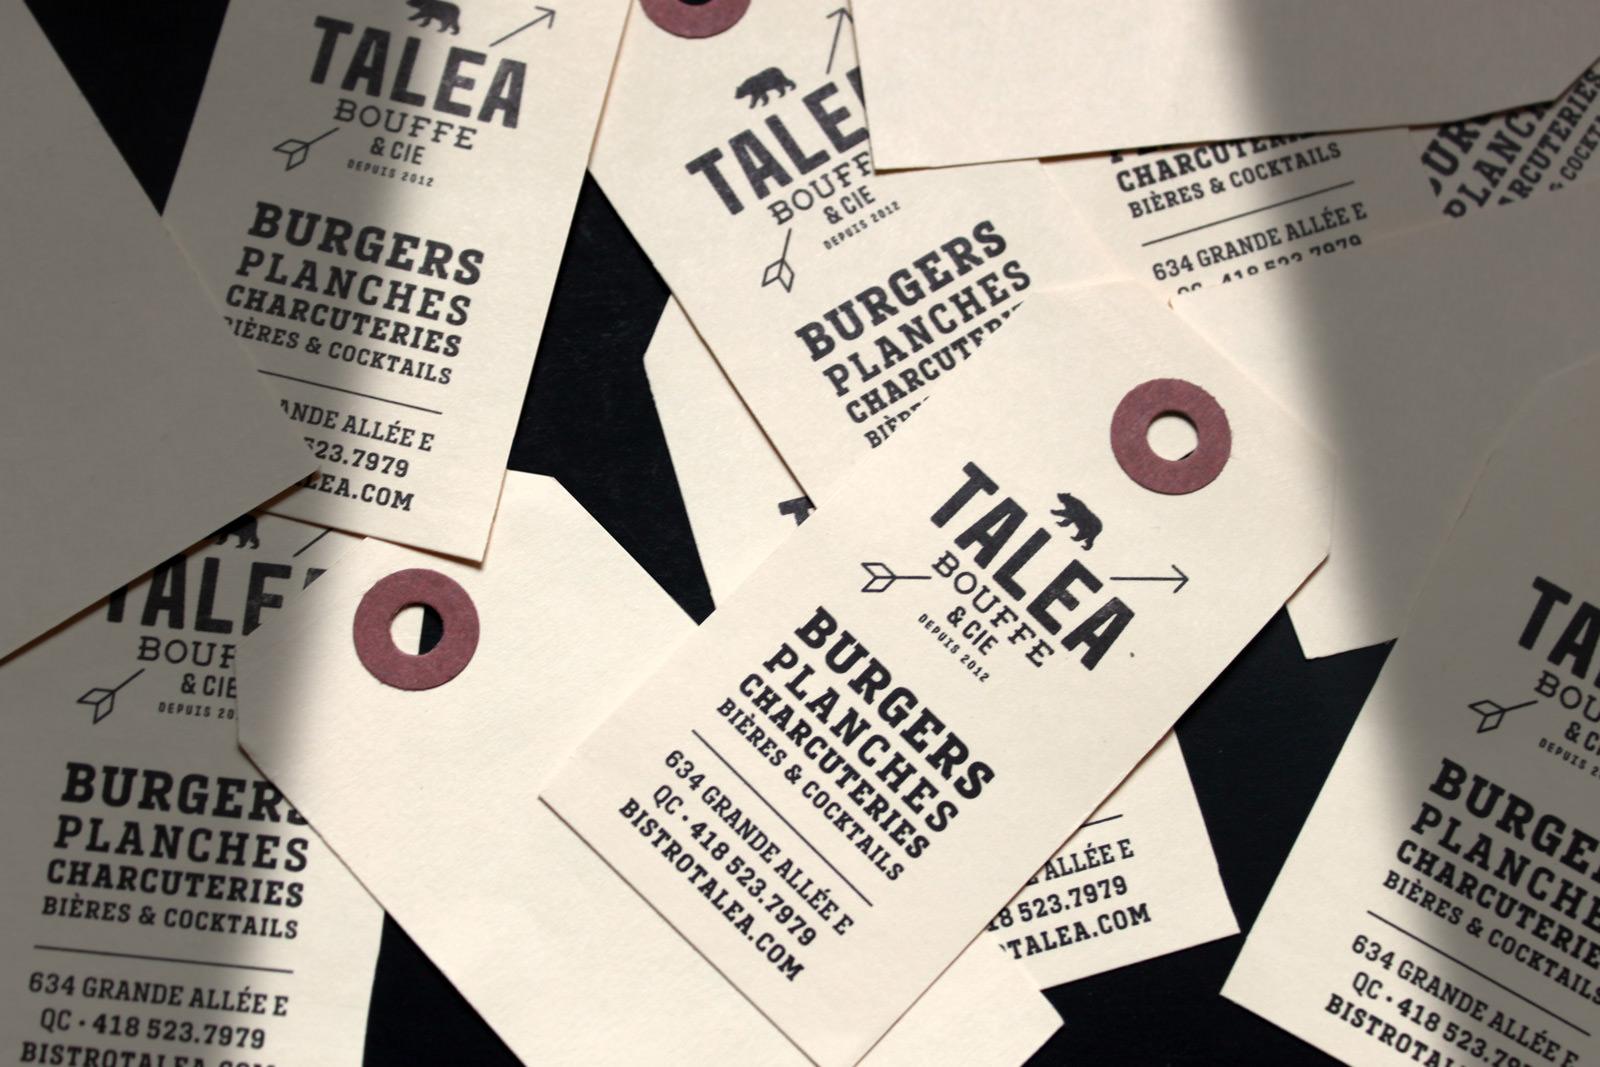 Figure-JeremyHall-Talea-Restaurant-Branding-CarteAffaire2.jpg